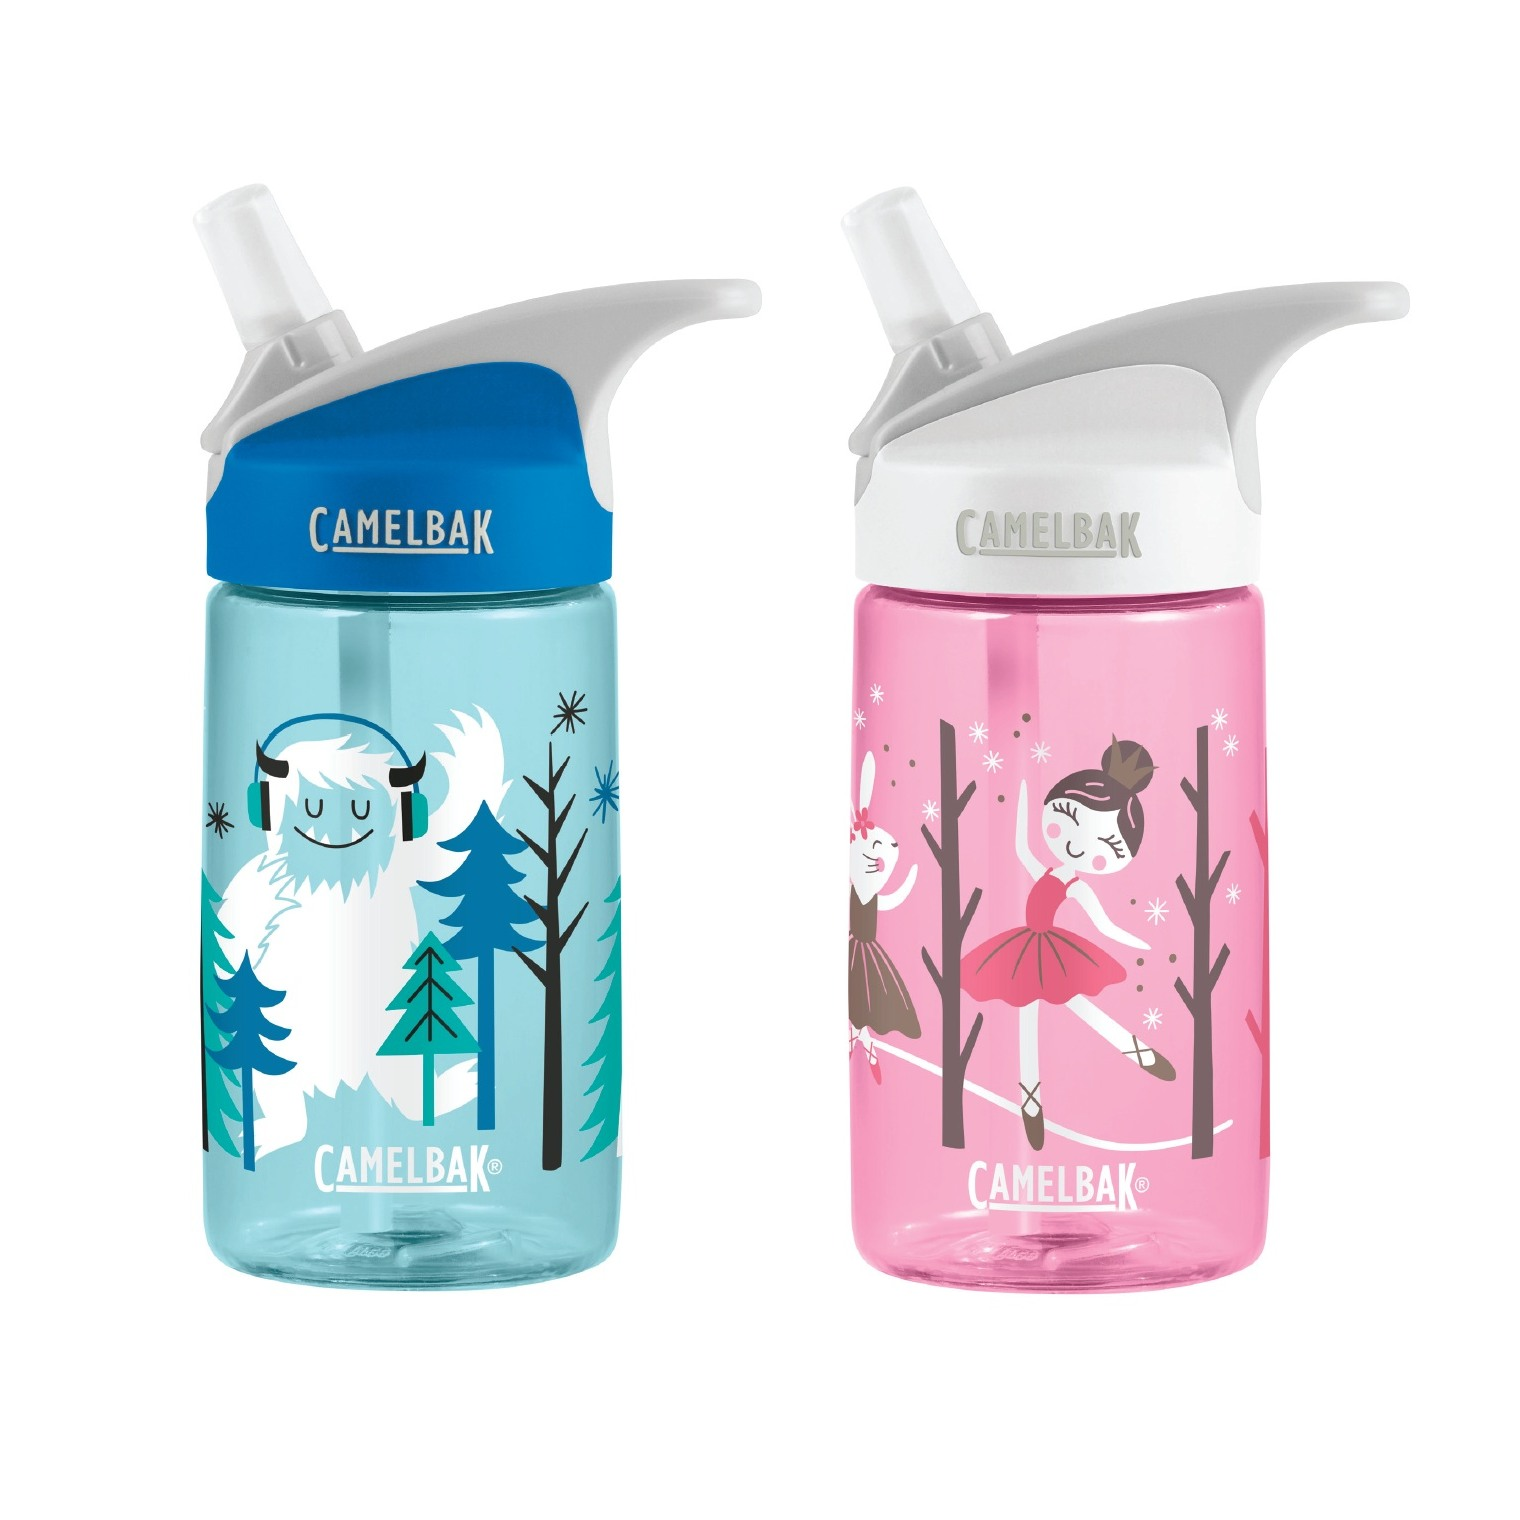 Limited Winter edition Camelbak Eddy Kids 400ml//12oz spill proof water bottle